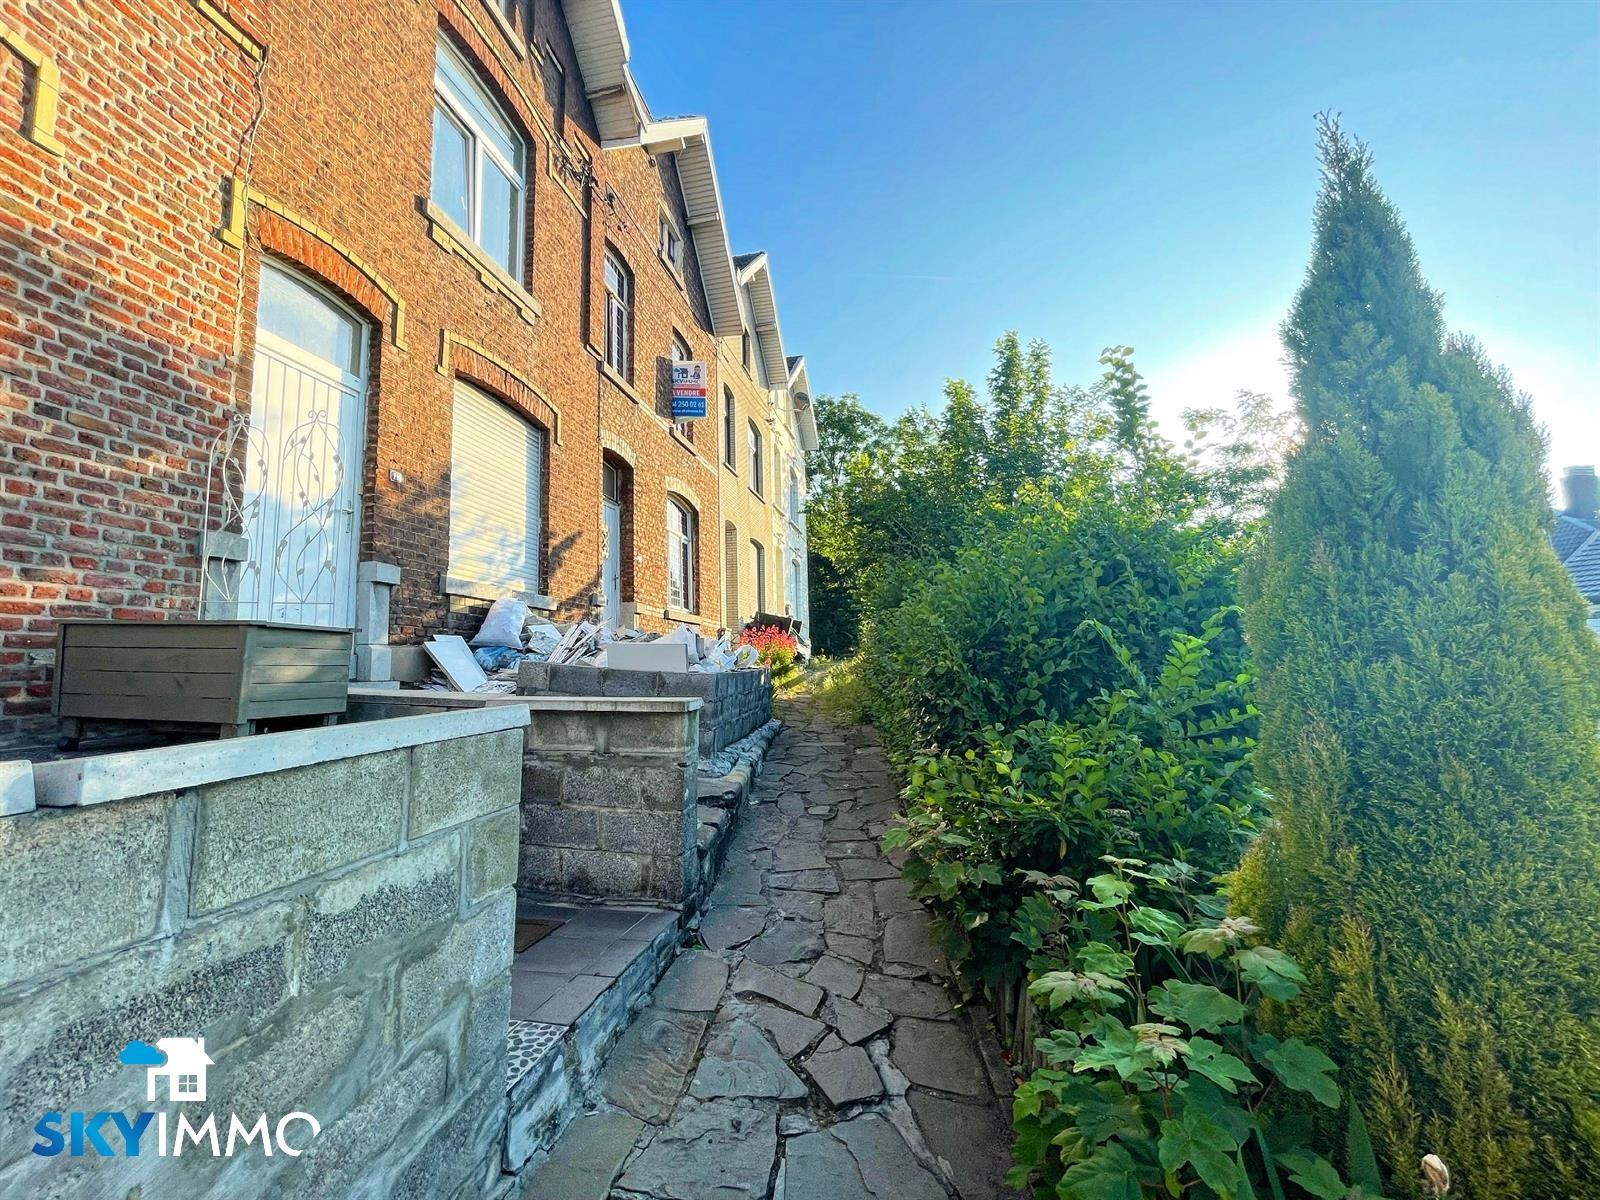 Maison - Seraing Jemeppesur-Meuse - #4383857-1